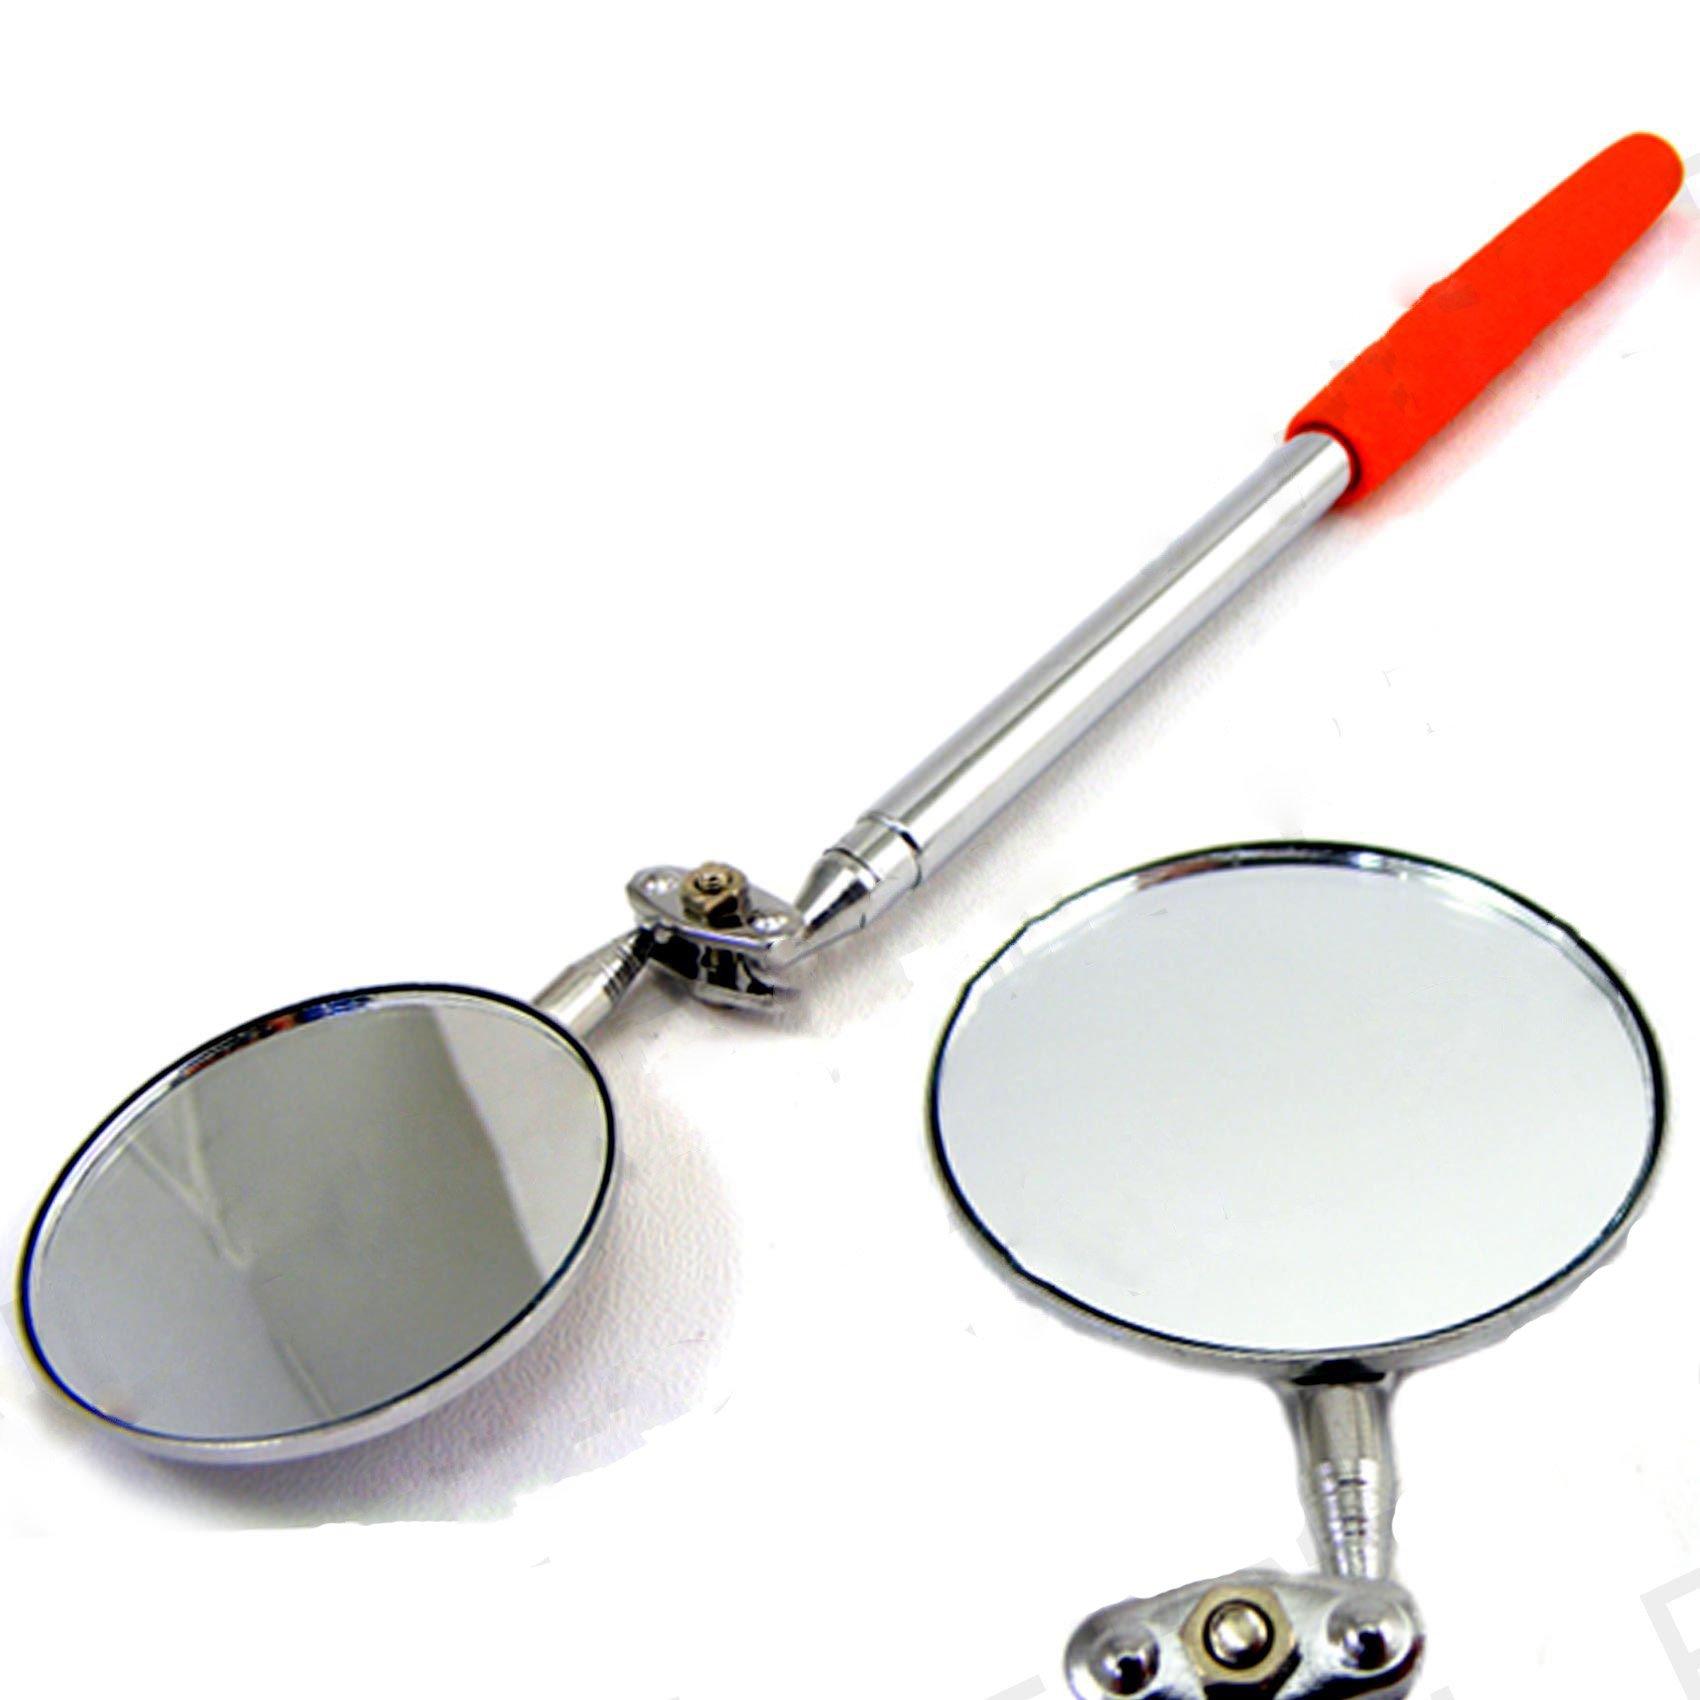 White Hinge Large 5cm Telescopic Inspection Mirror - Angle Swivel Arm Car Mechanic Engine Tool